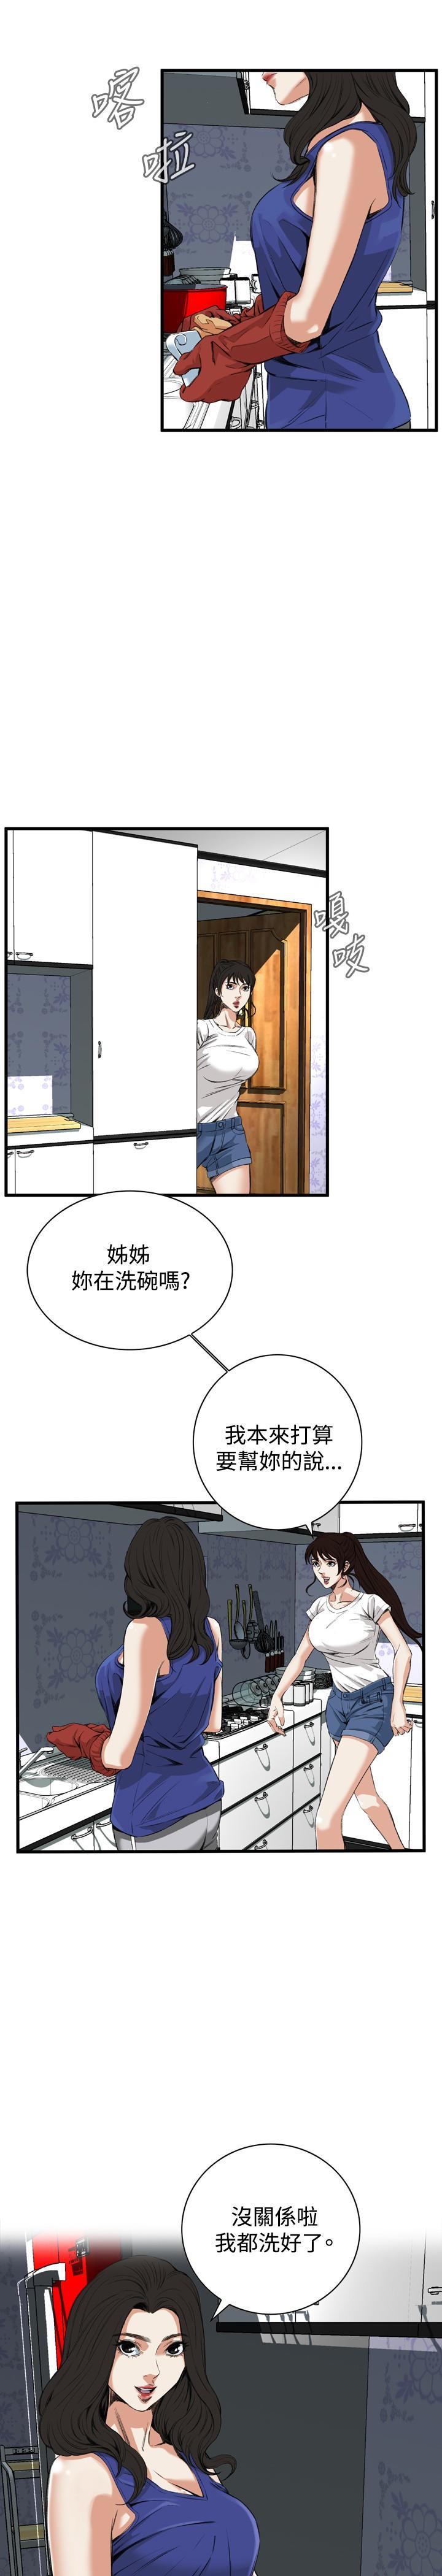 Take a Peek 偷窥 Ch.39~51 [Chinese]中文 211